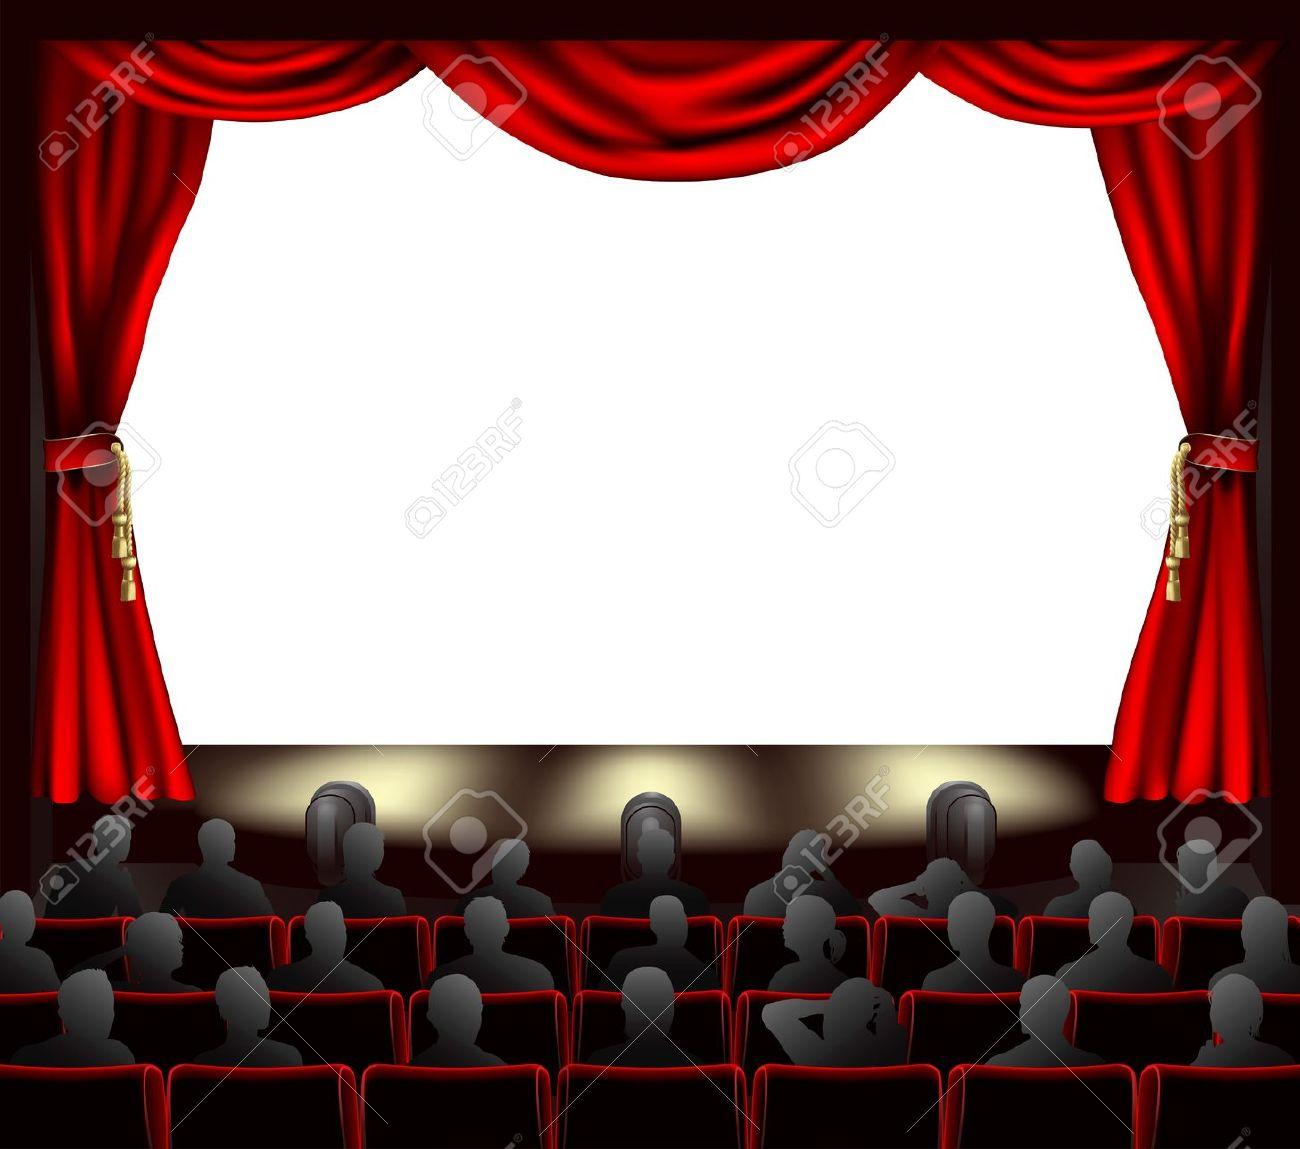 Movie curtains clipart.